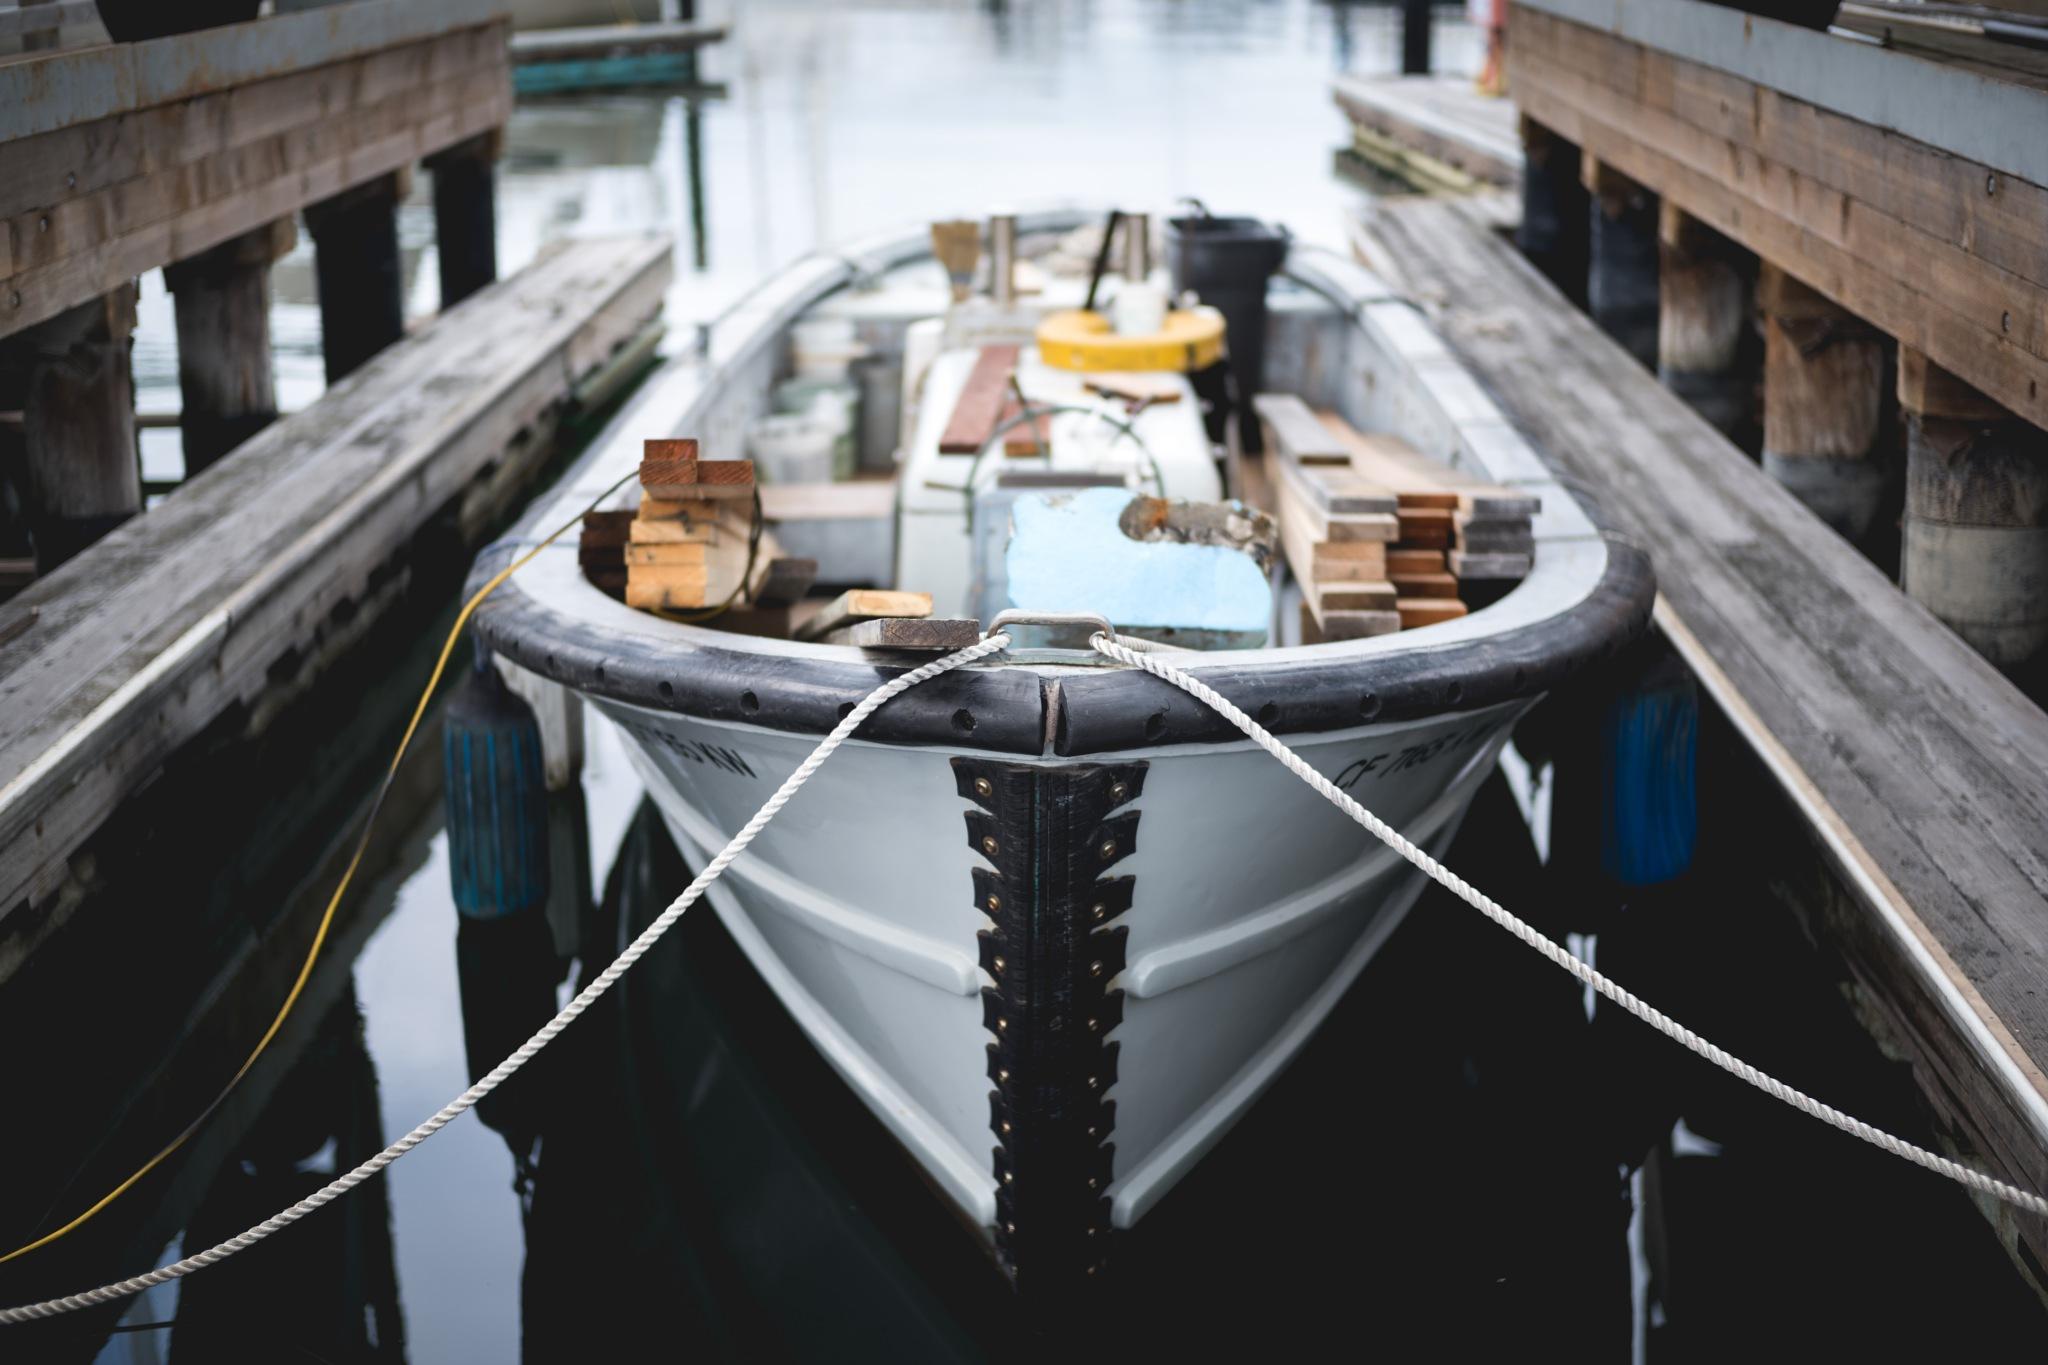 Boat full of junk  by James Wilkinson